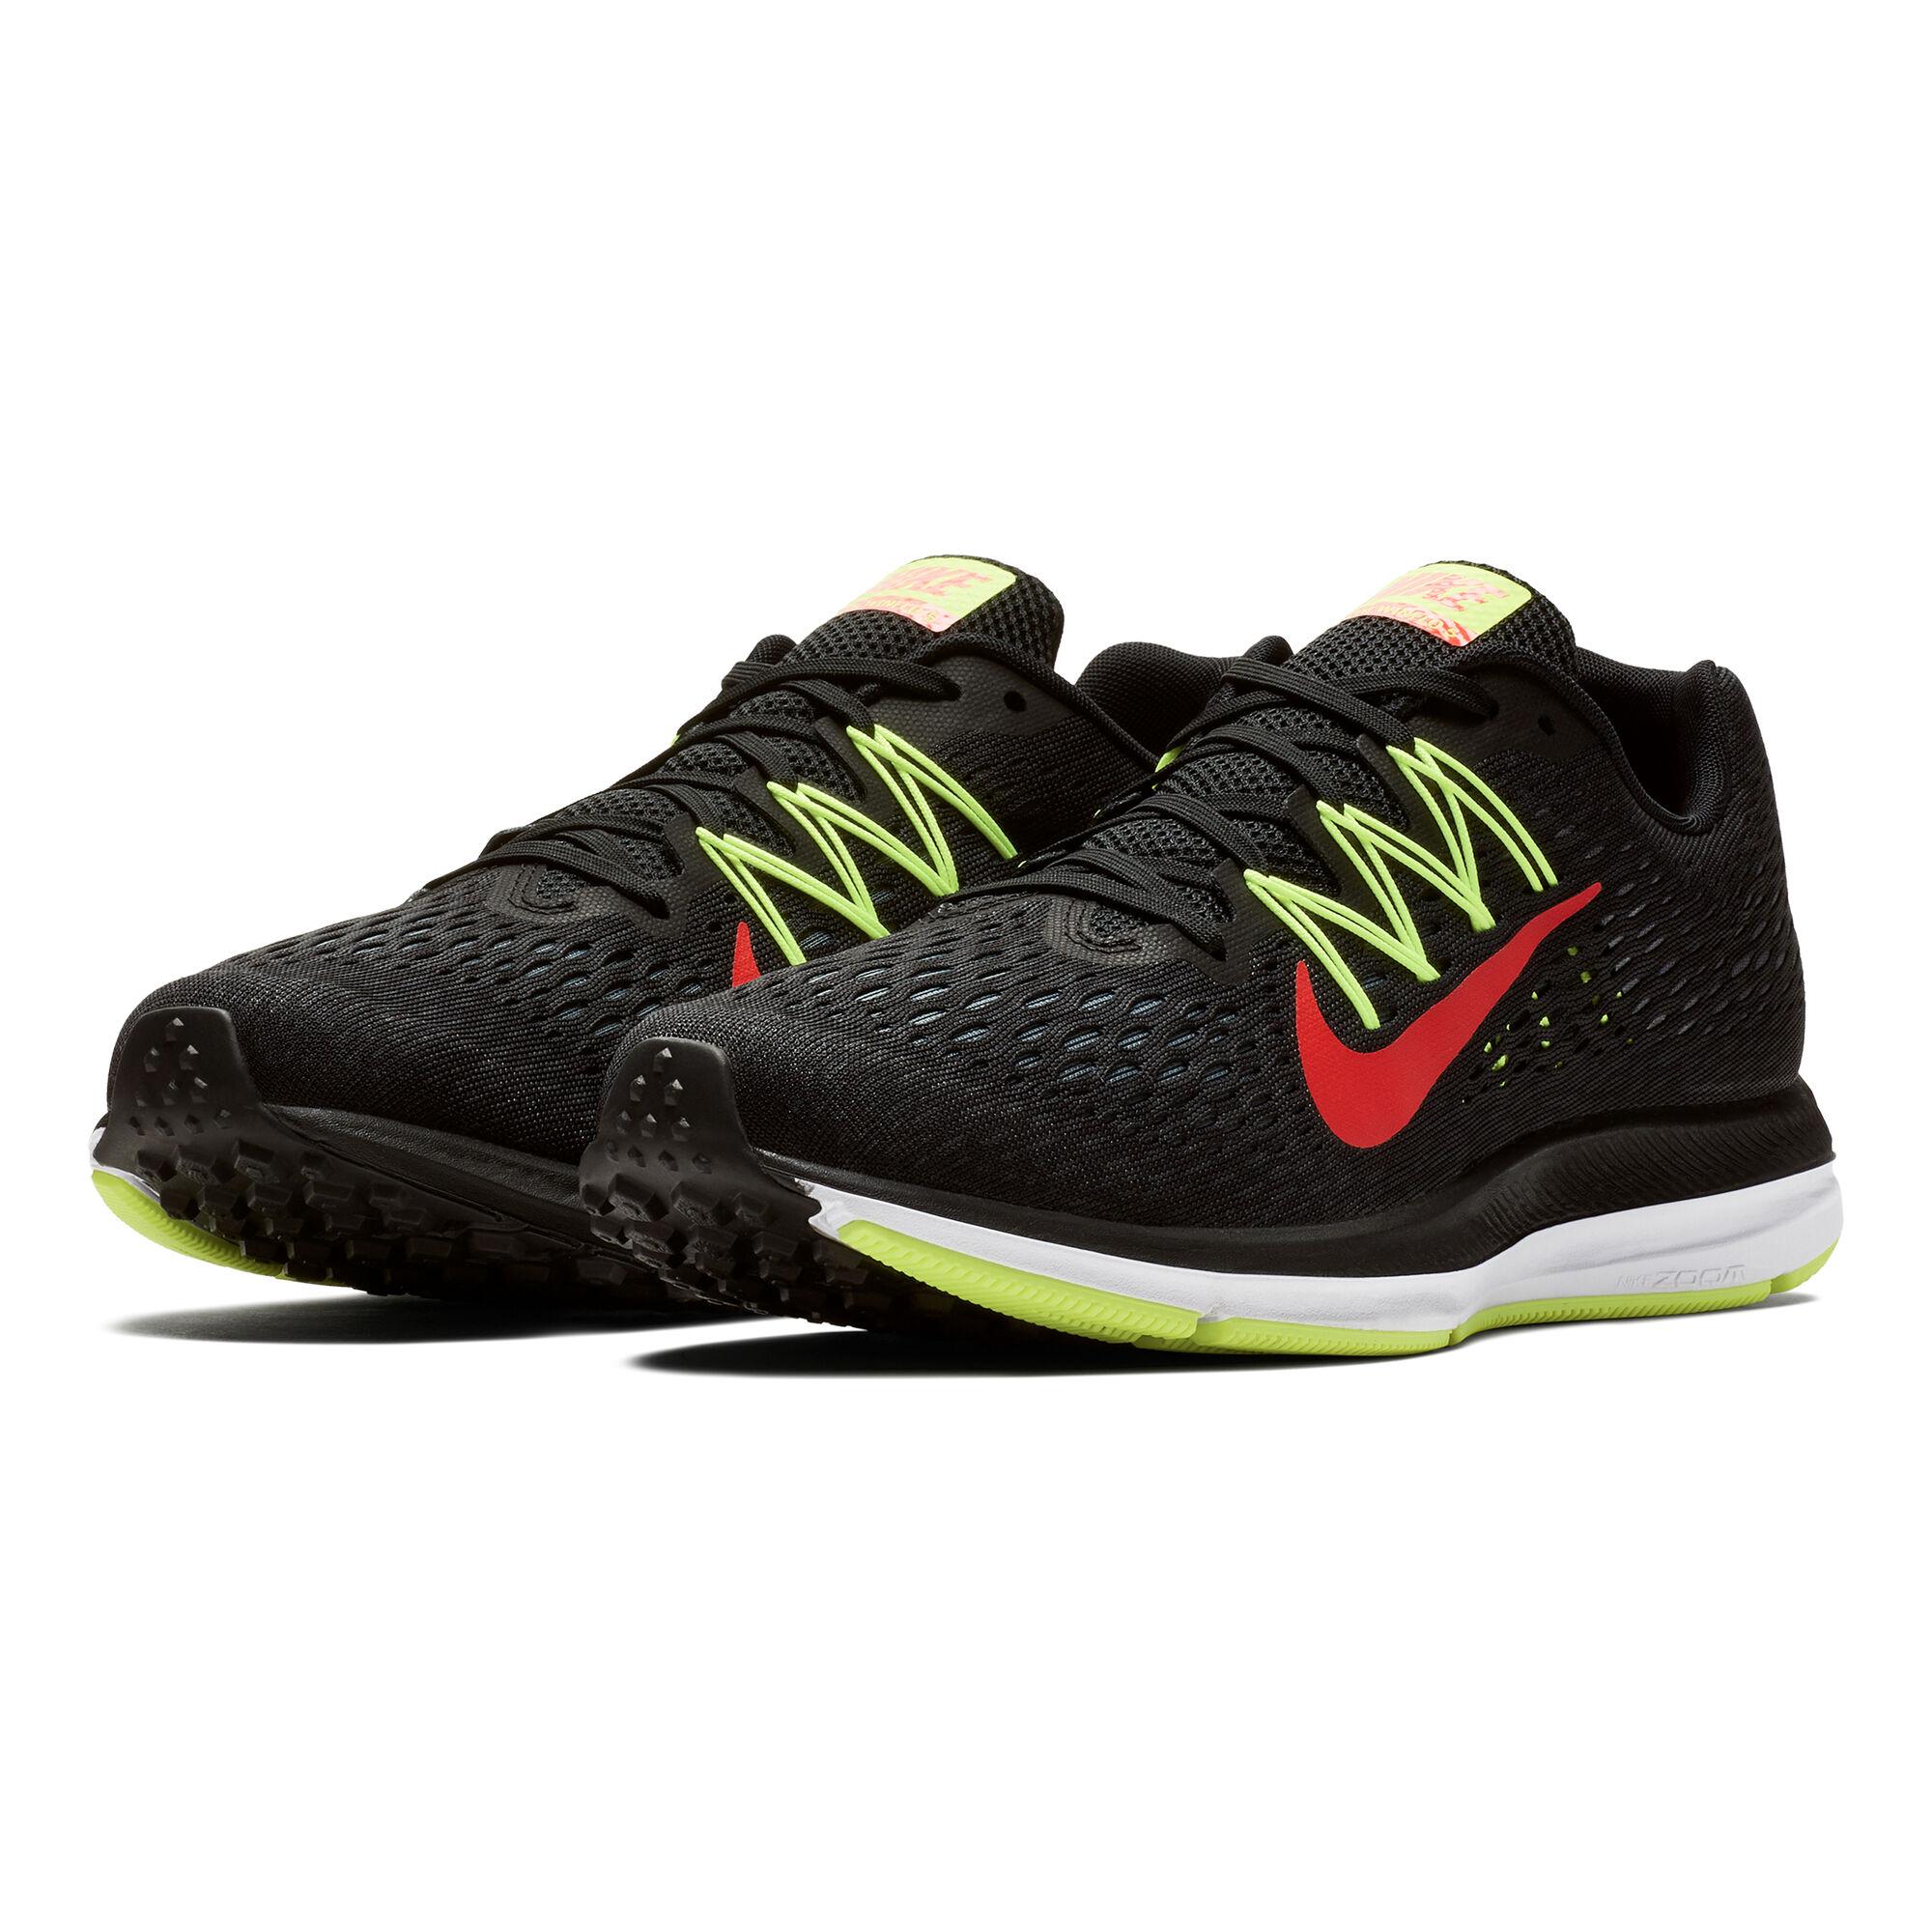 b3387d01c39 Nike Zoom Winflo 5 Herren - Schwarz, Neongrün online kaufen ...